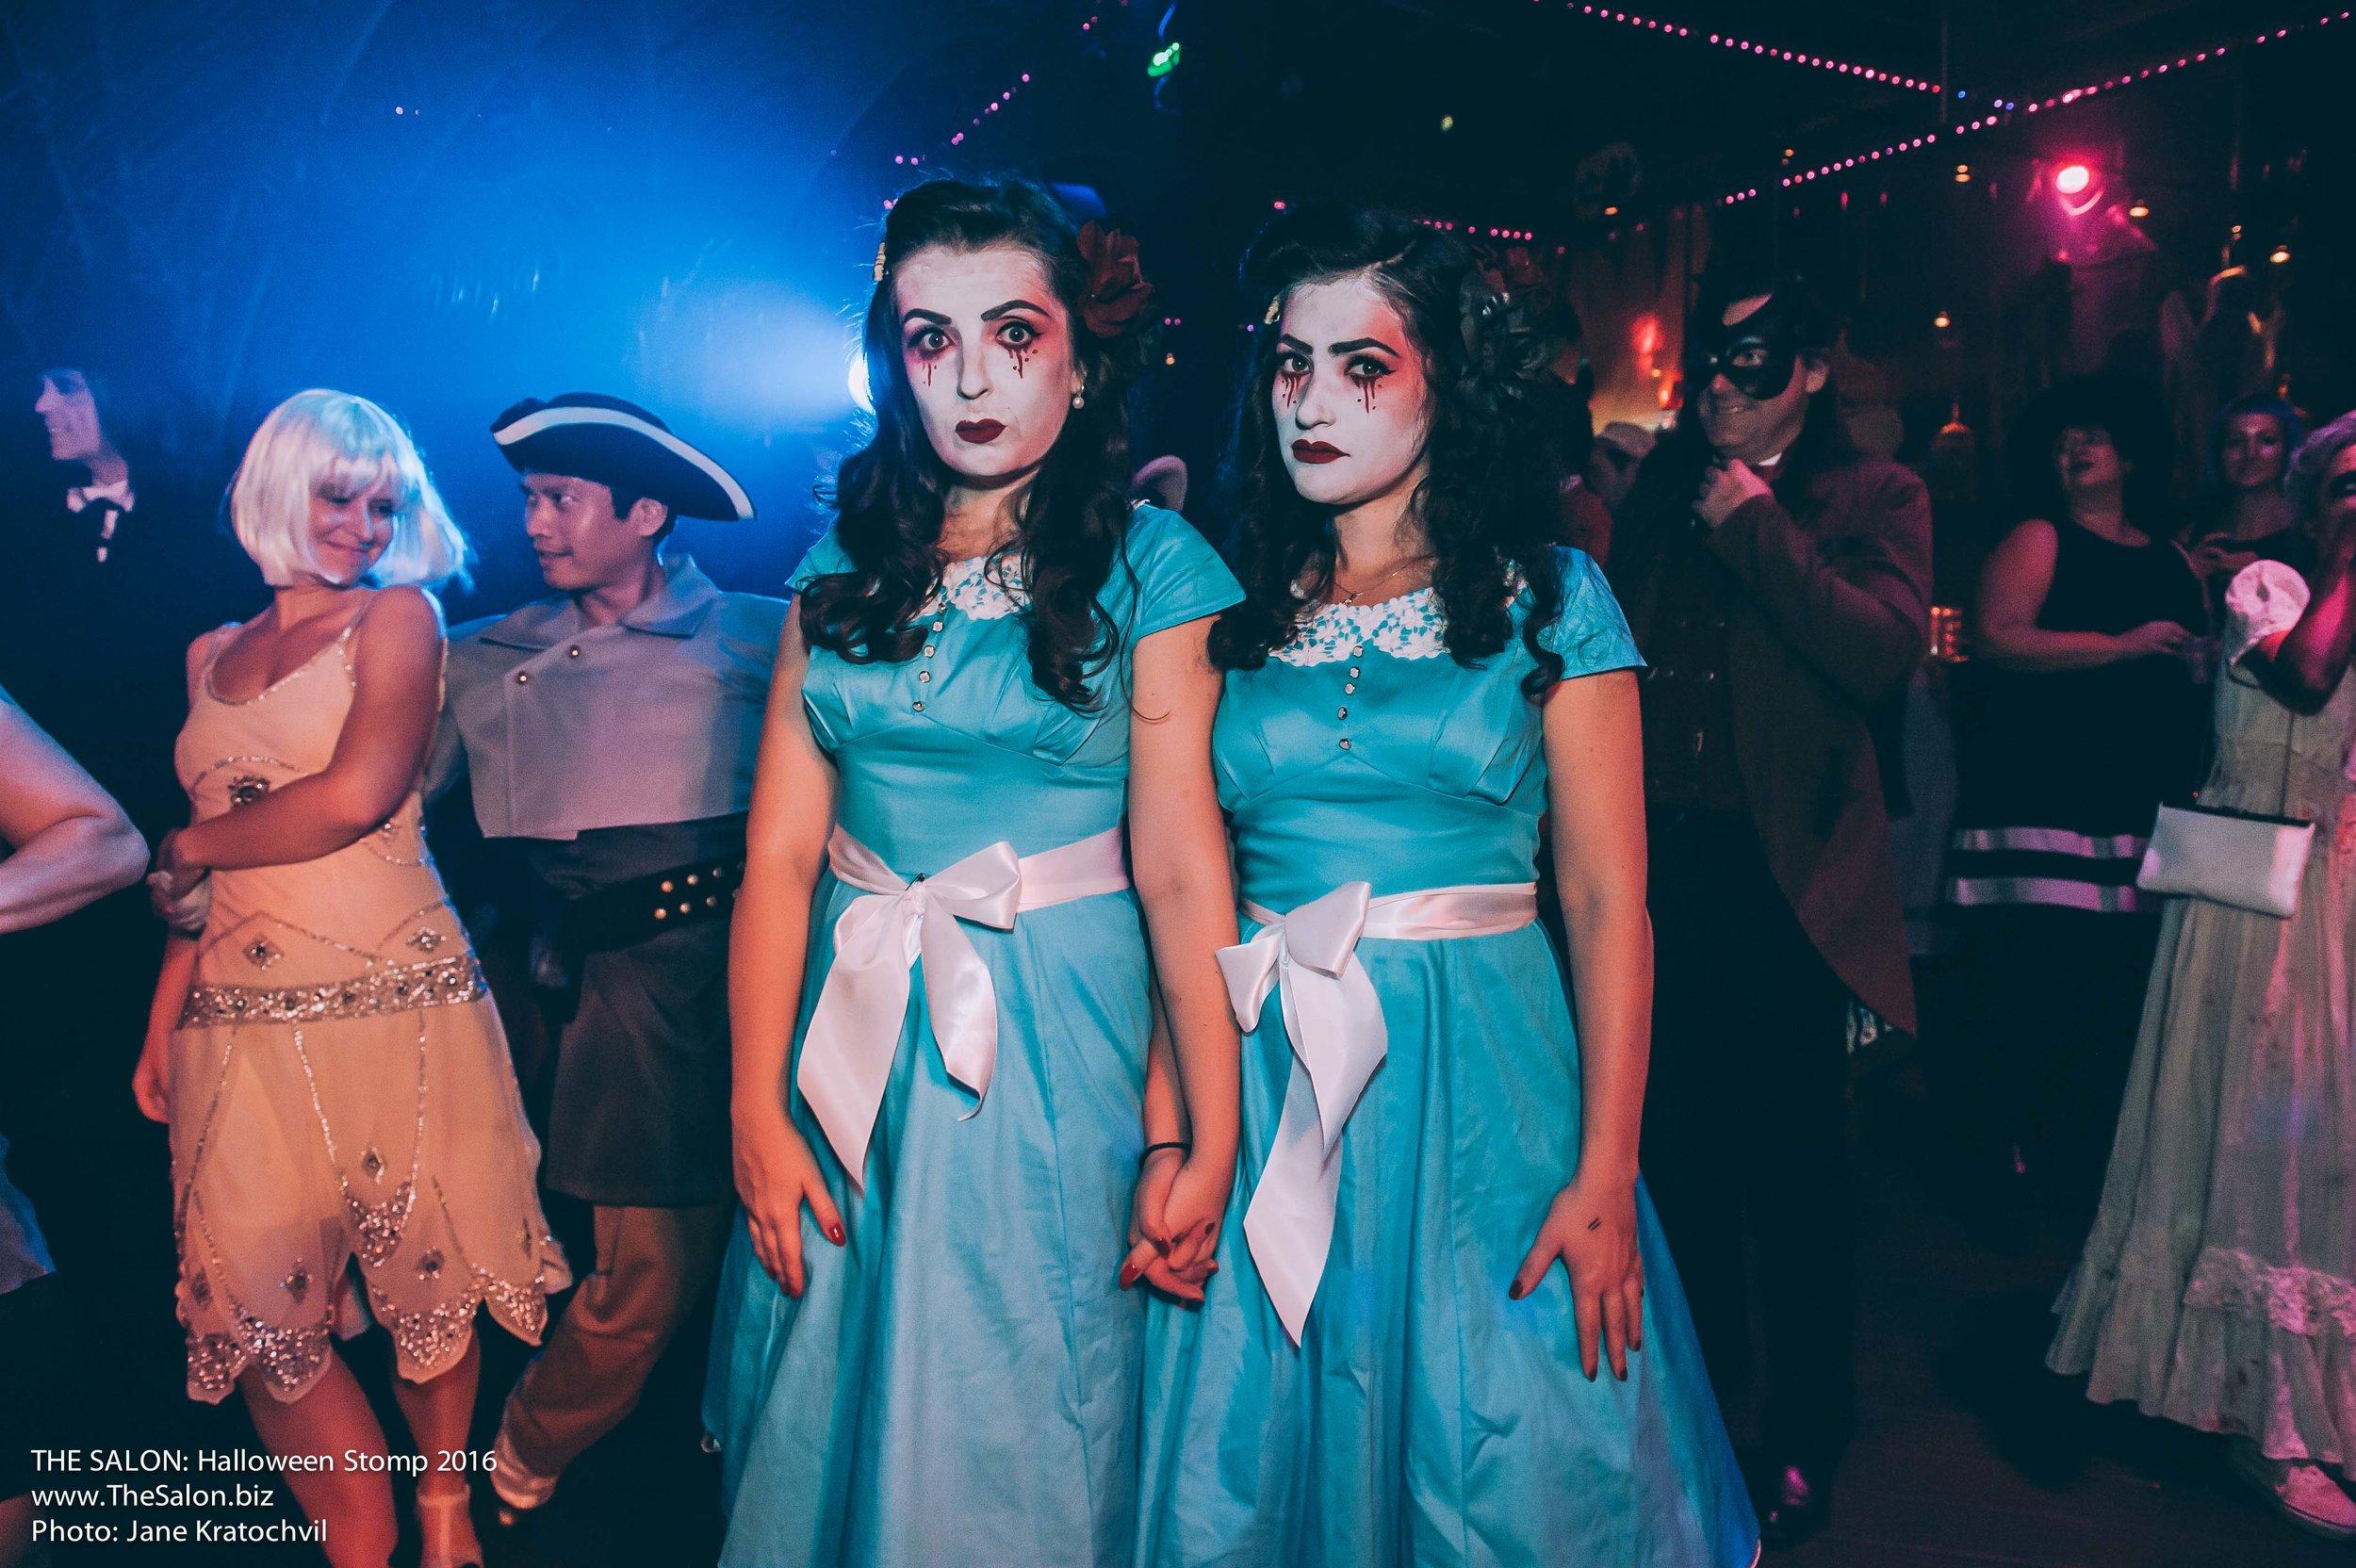 THE-SALON_HalloweenStomp16__photocredit-jane-kratochvil__0730.jpg